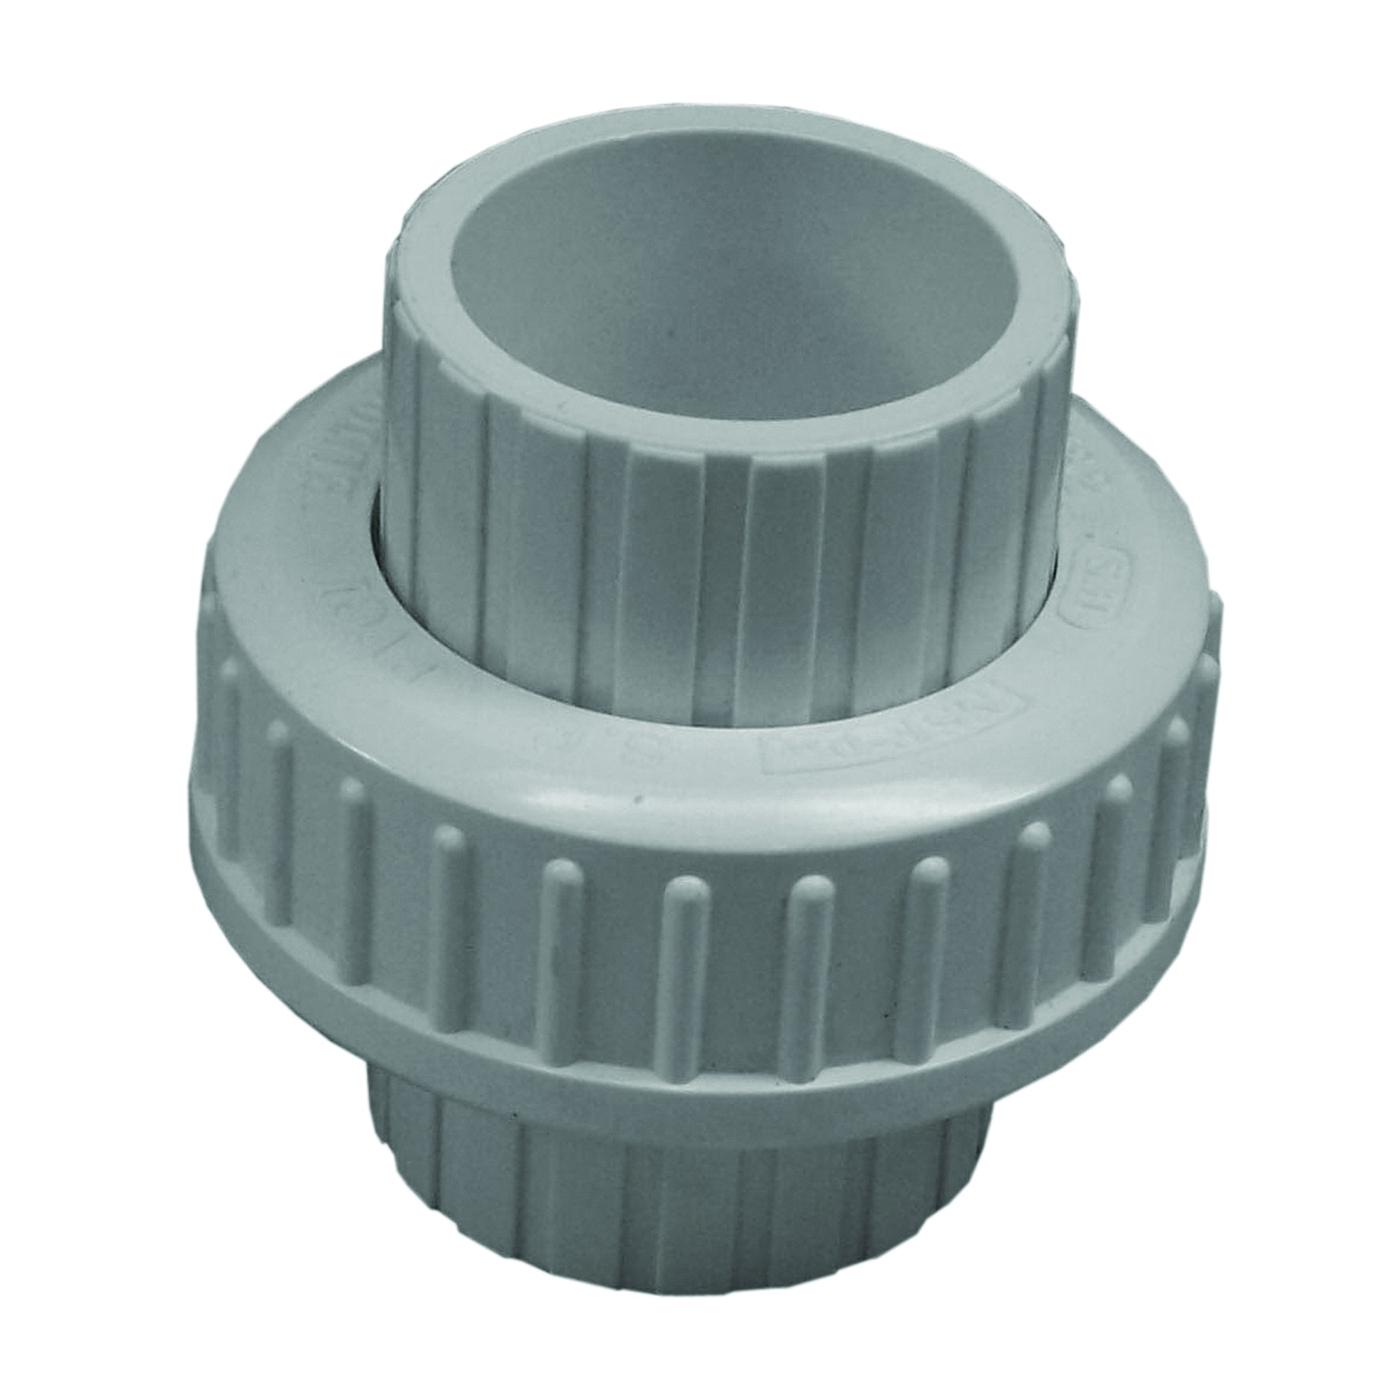 Picture of GENOVA 300 Series 37207 Pipe Union, 3/4 in, Slip Joint, SCH 40 Schedule, 150 psi Pressure